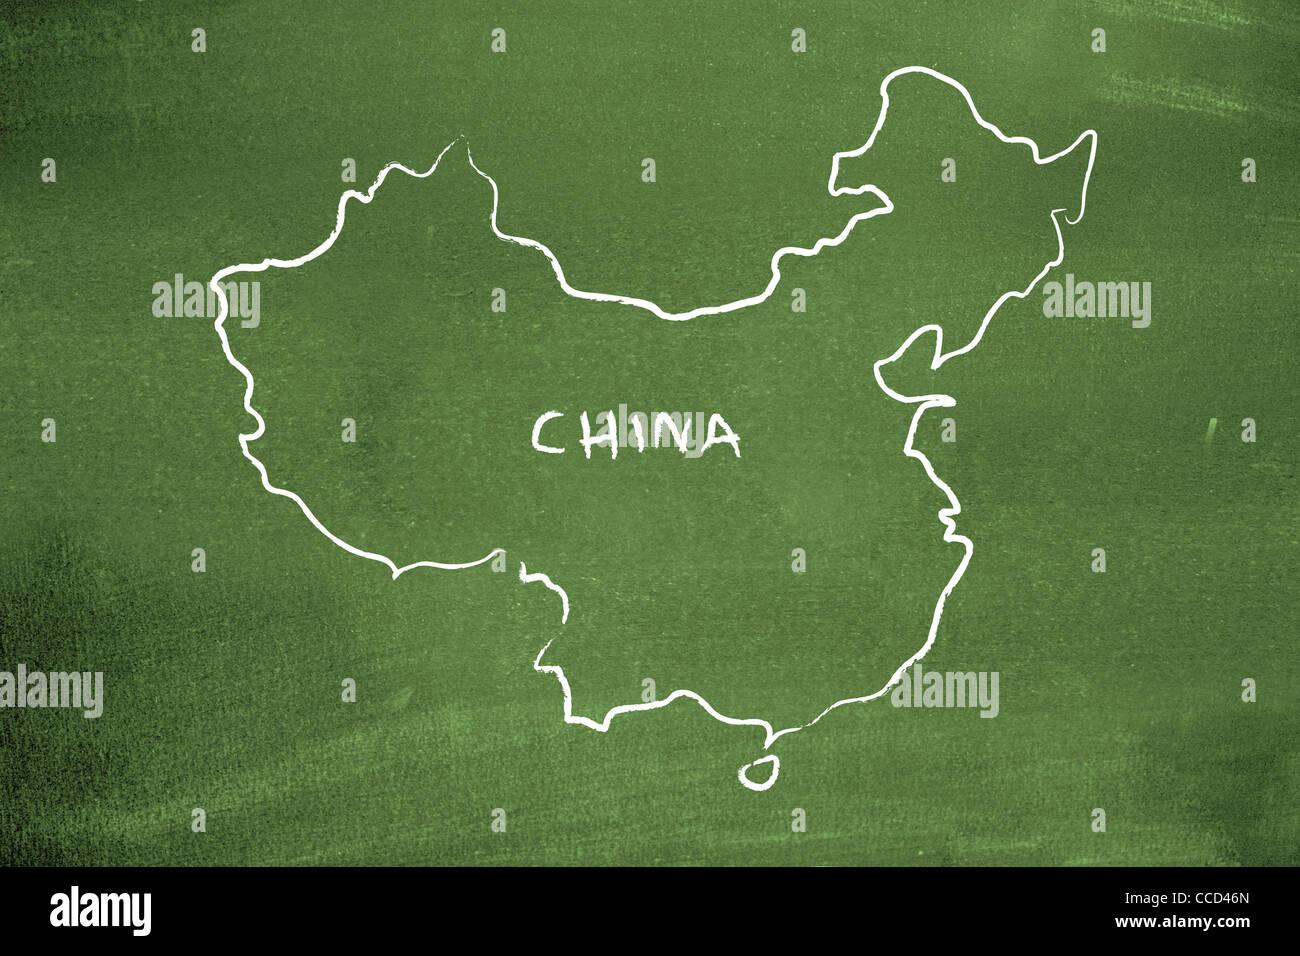 China - Stock Image